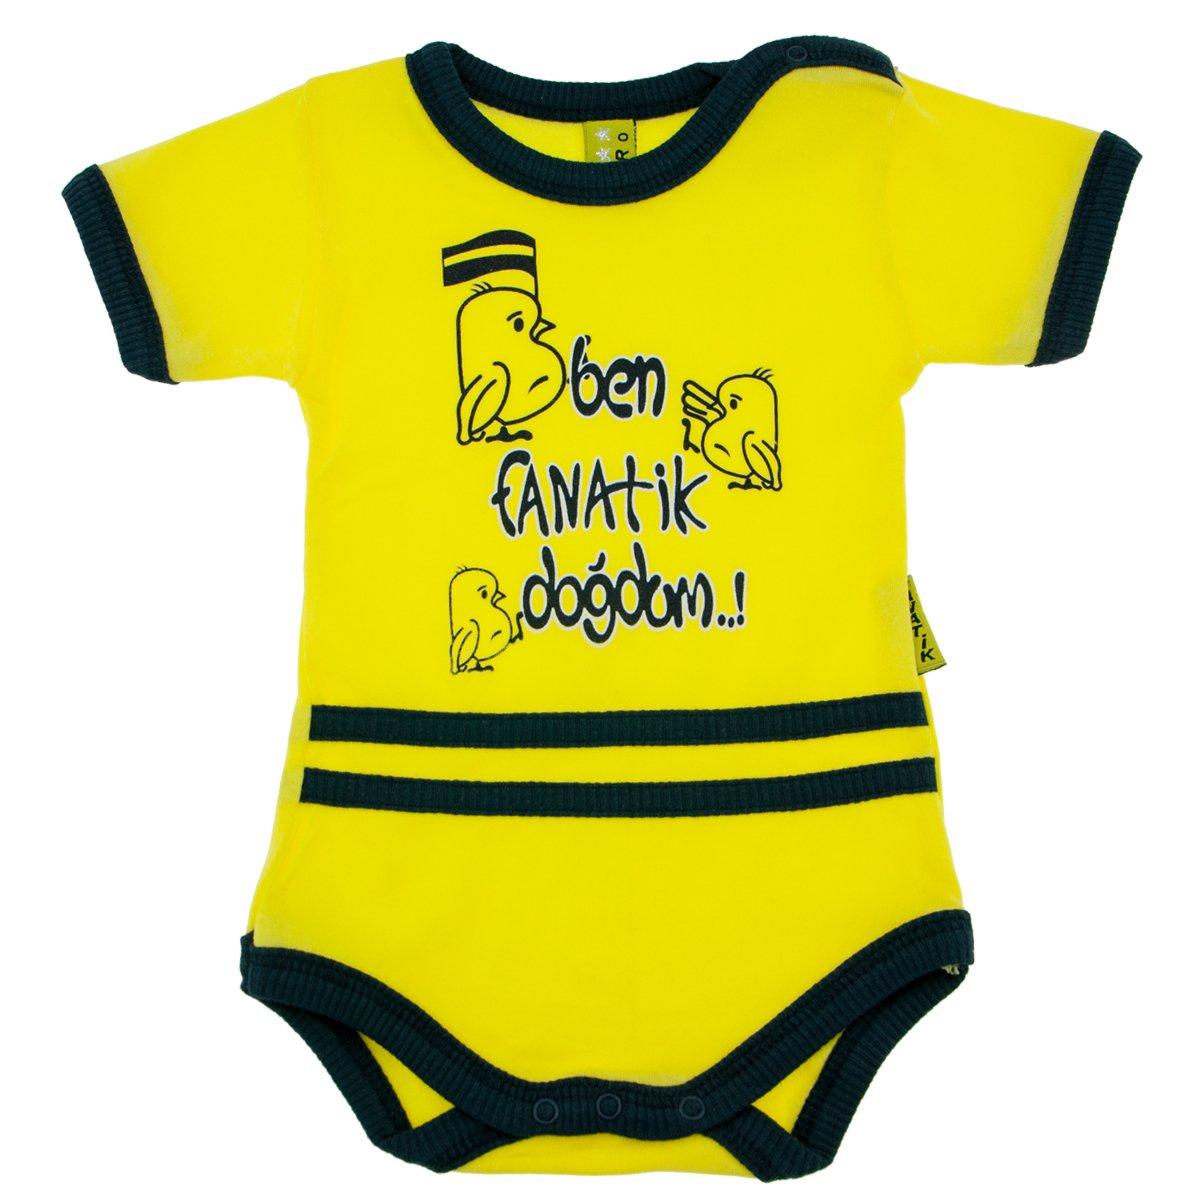 Neco Moden FenerbahceTaraftar Baby Bebek Body Badi Fanatik Sari kanarya Cim Bom Kara Kartal Galatasaray Fenerbahce (9-12 Monate)